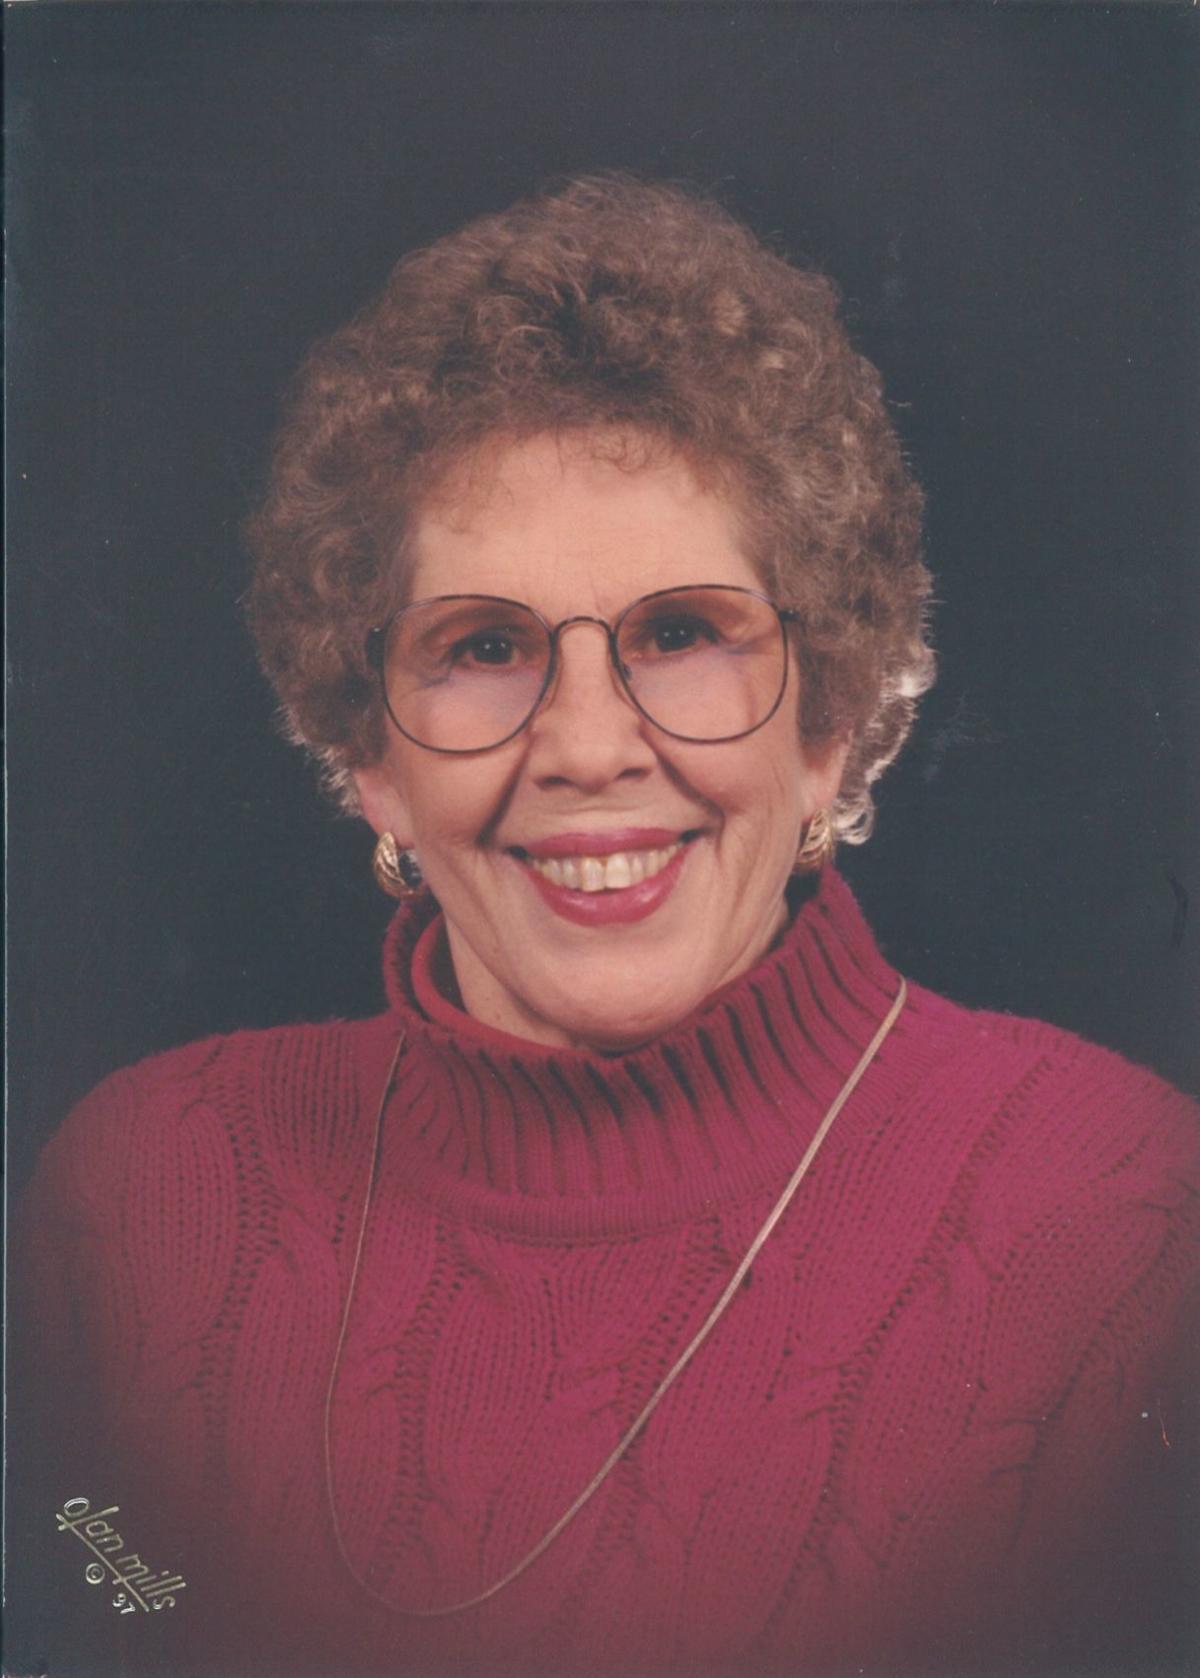 Obituary: Phyllis Jean Wales